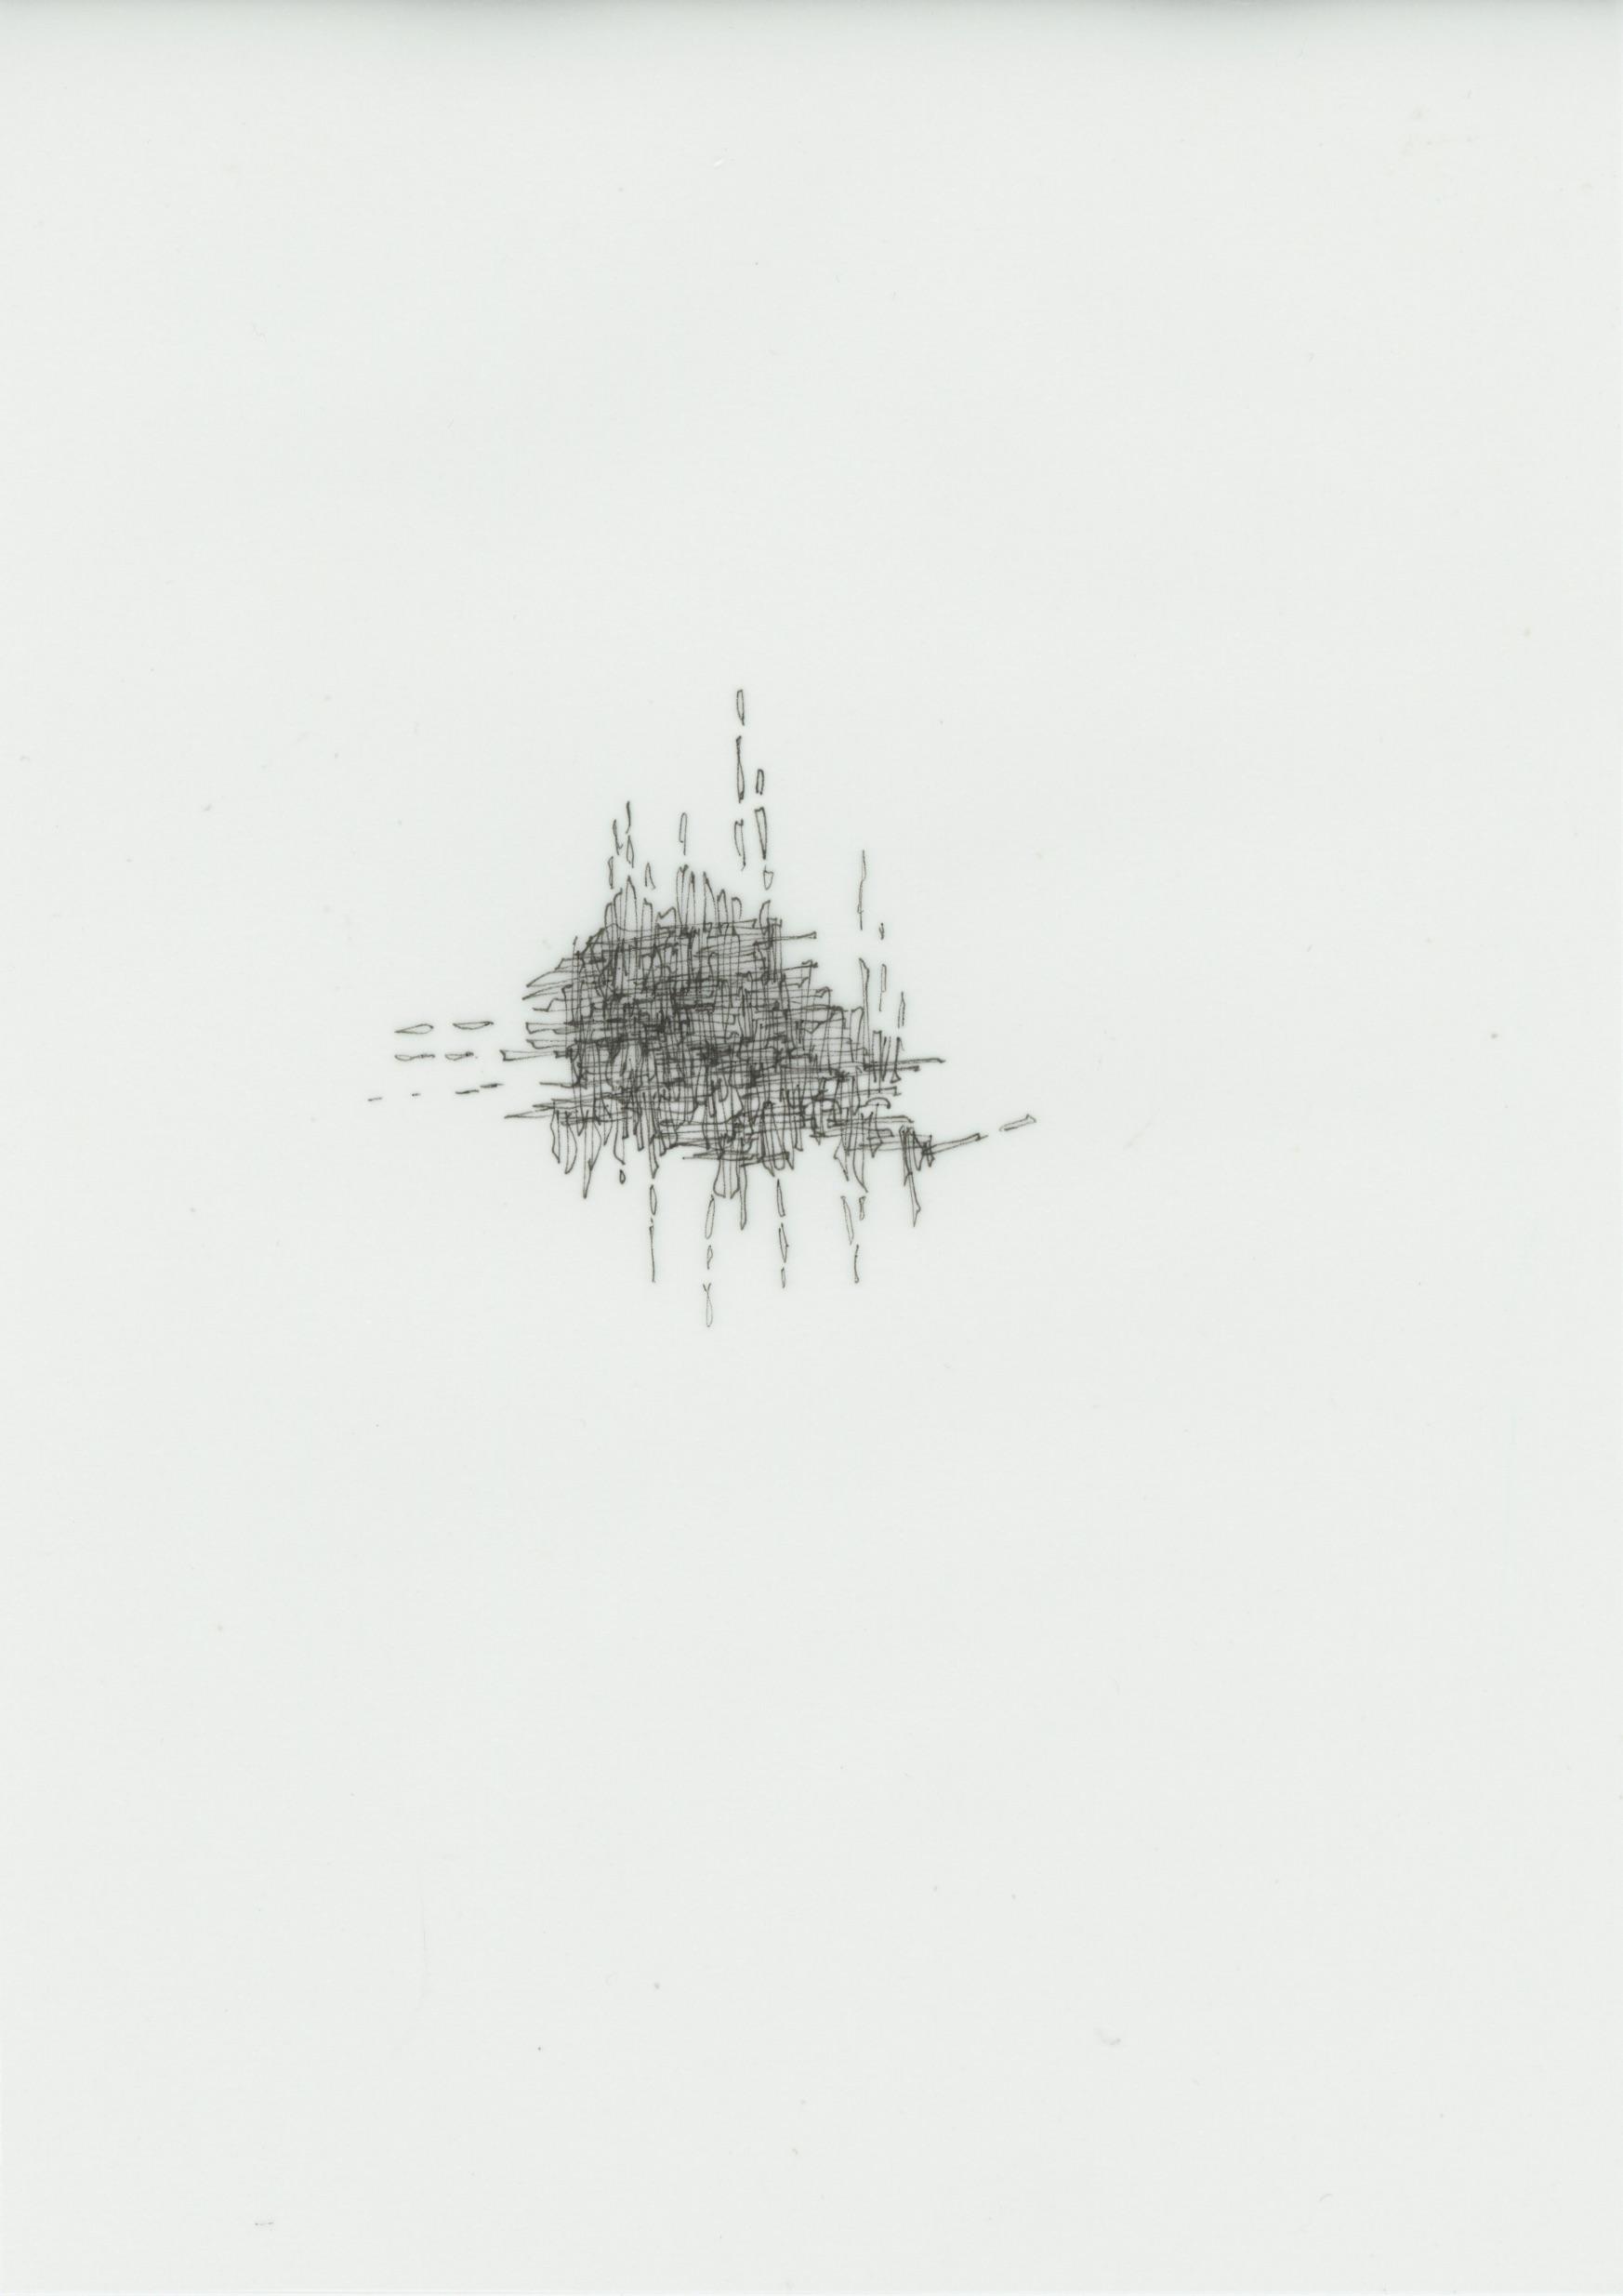 050819.99.All the Birds in the Sky.jpg